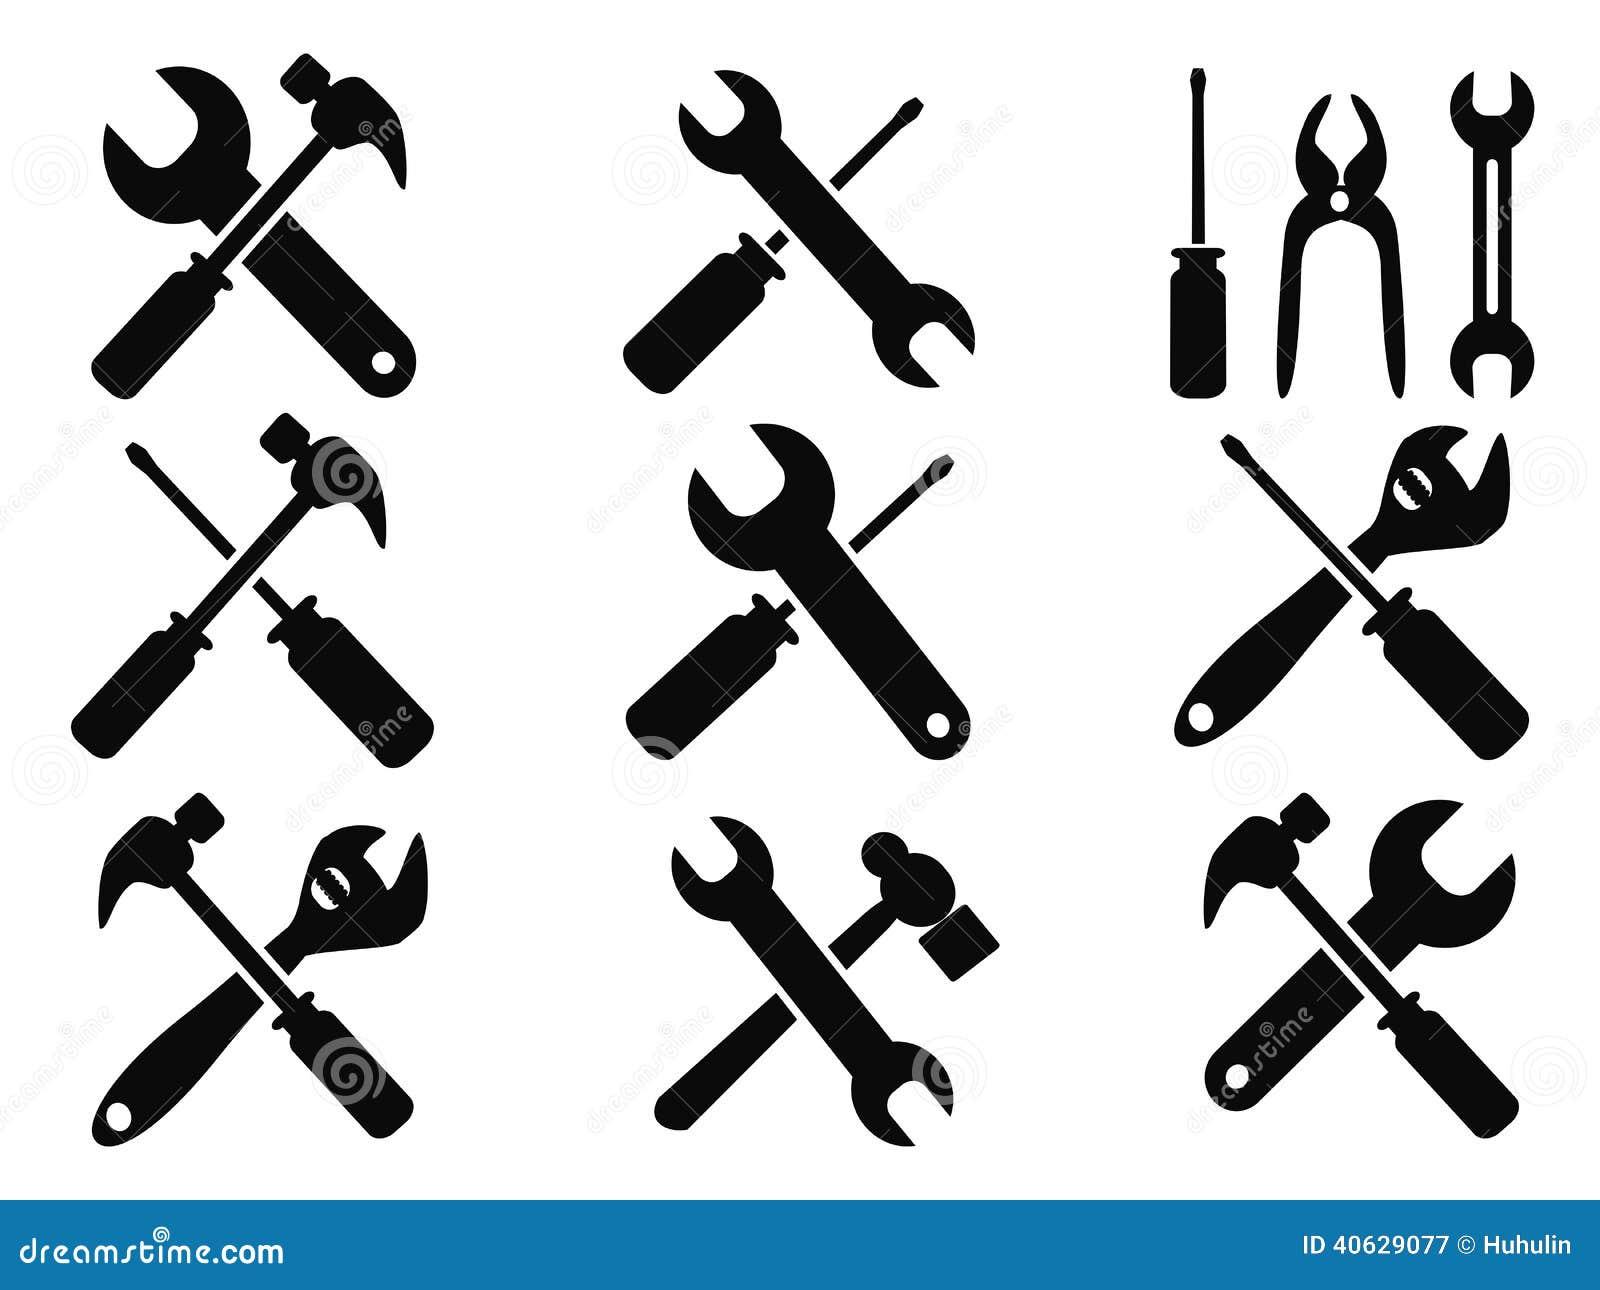 clipart mechanic tools - photo #50